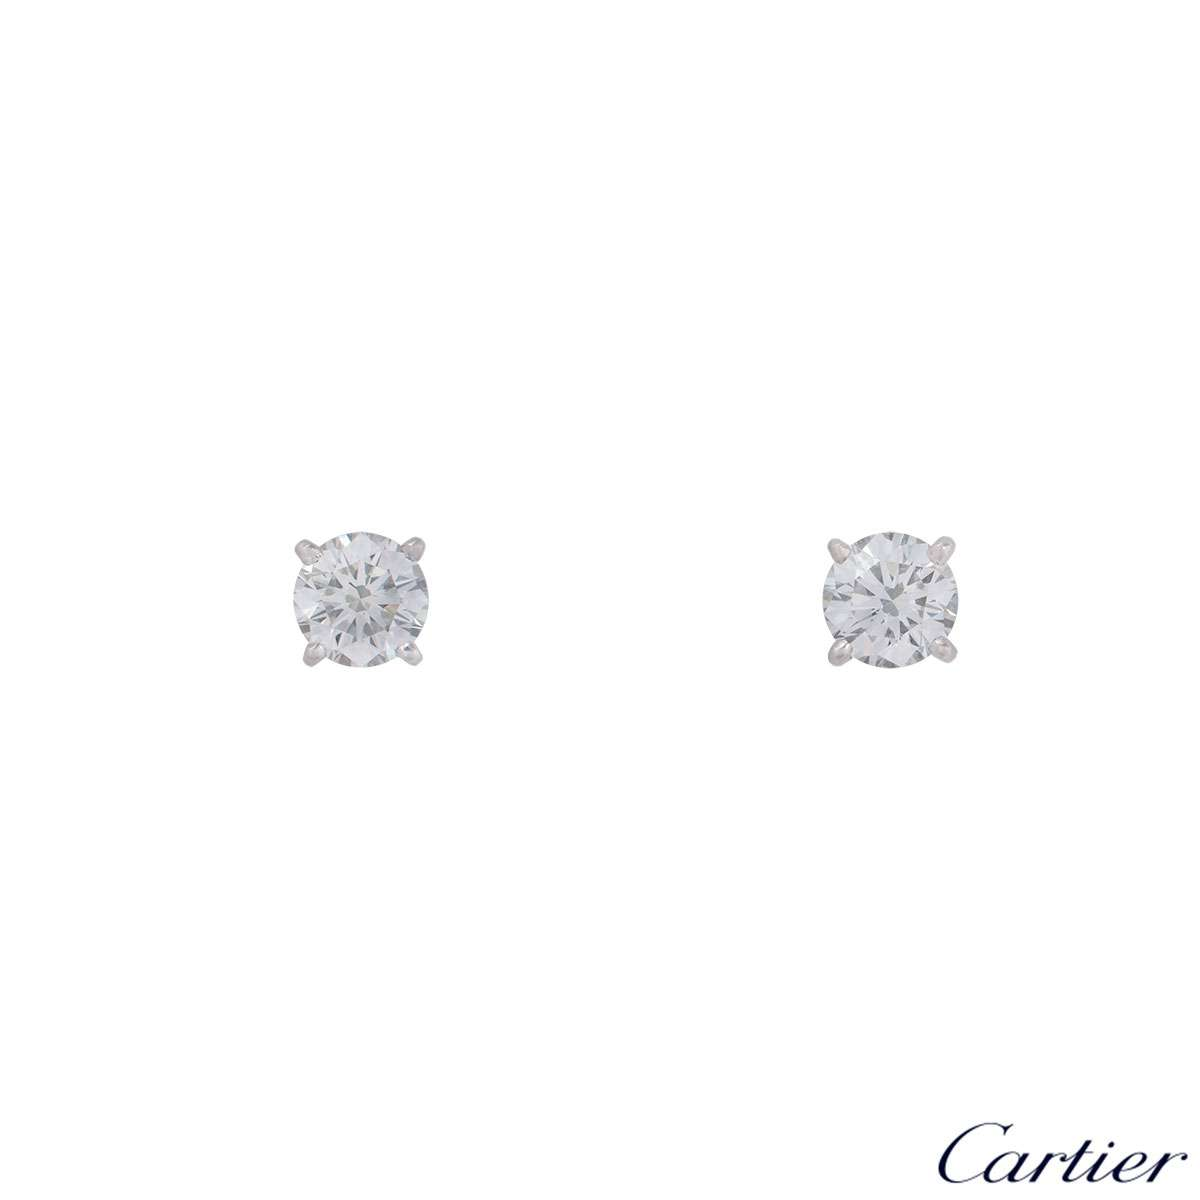 Cartier Platinum Diamond Earrings N8024100